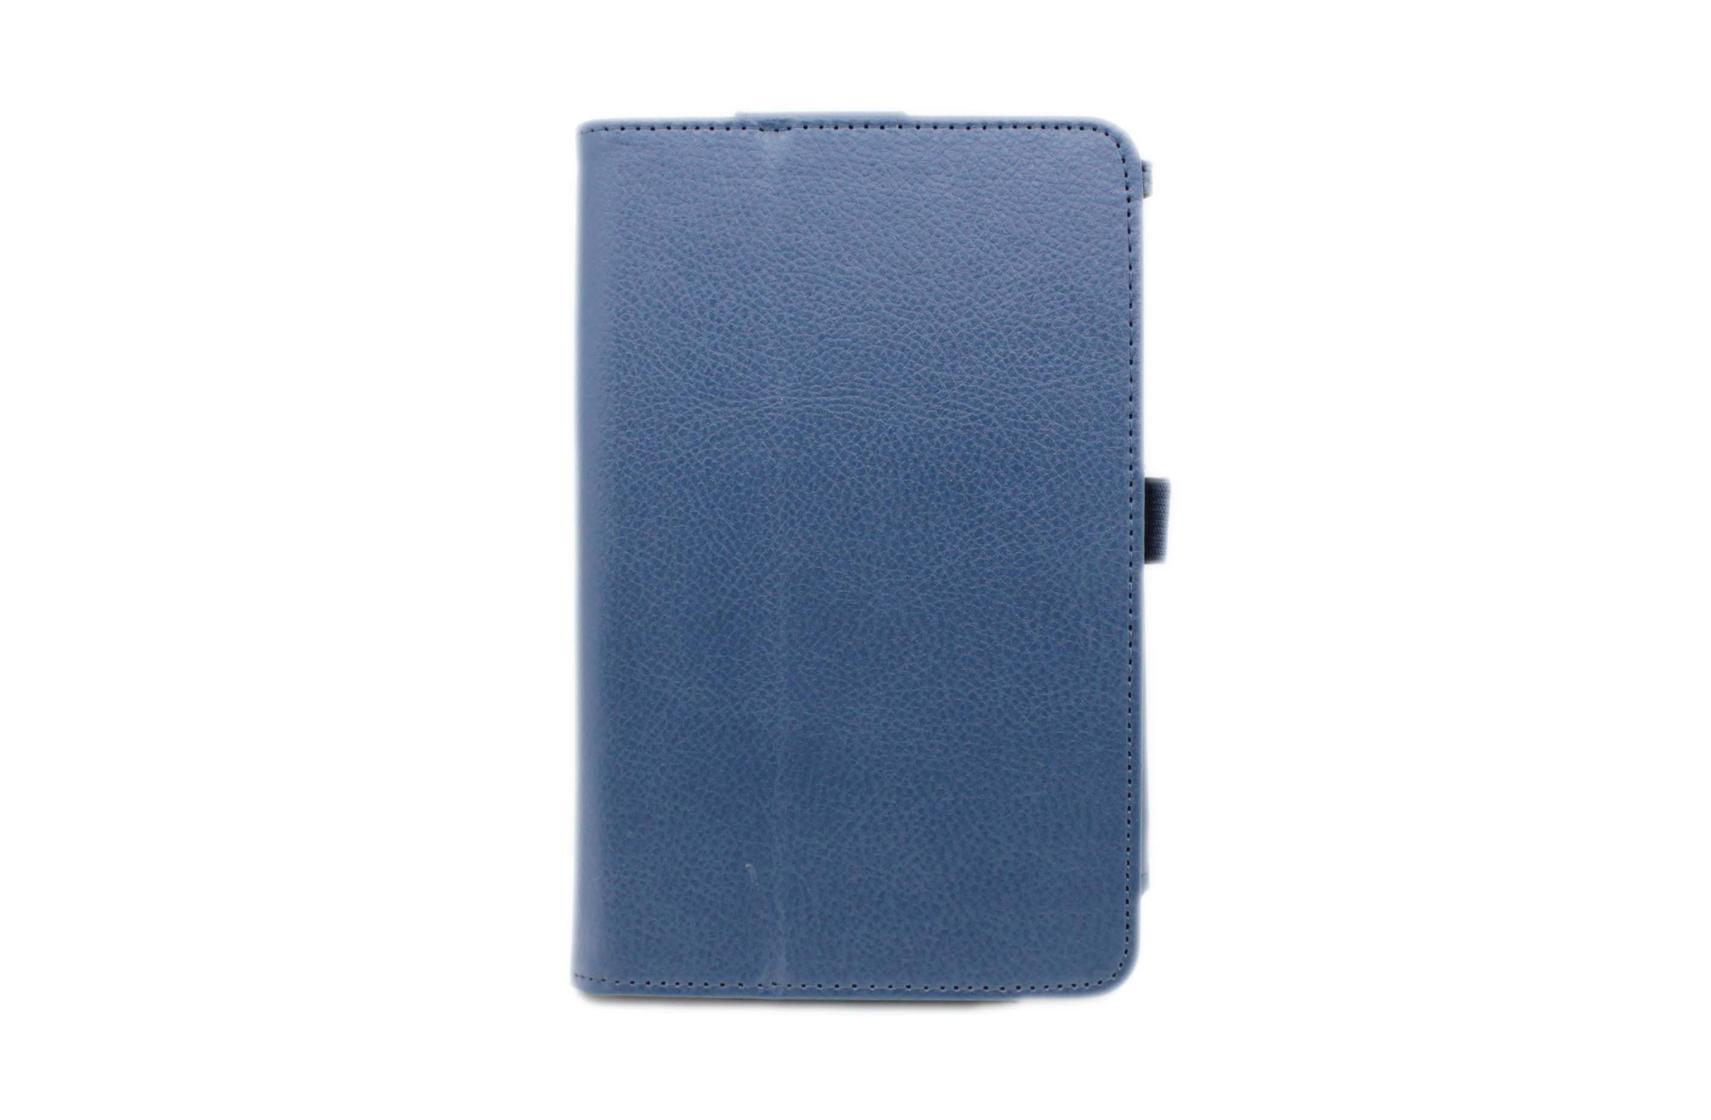 timeless design 88d52 6b60a Asus Fonepad 7 ME175 Ultra Slim Book Cover Case Casing [D.Blue]